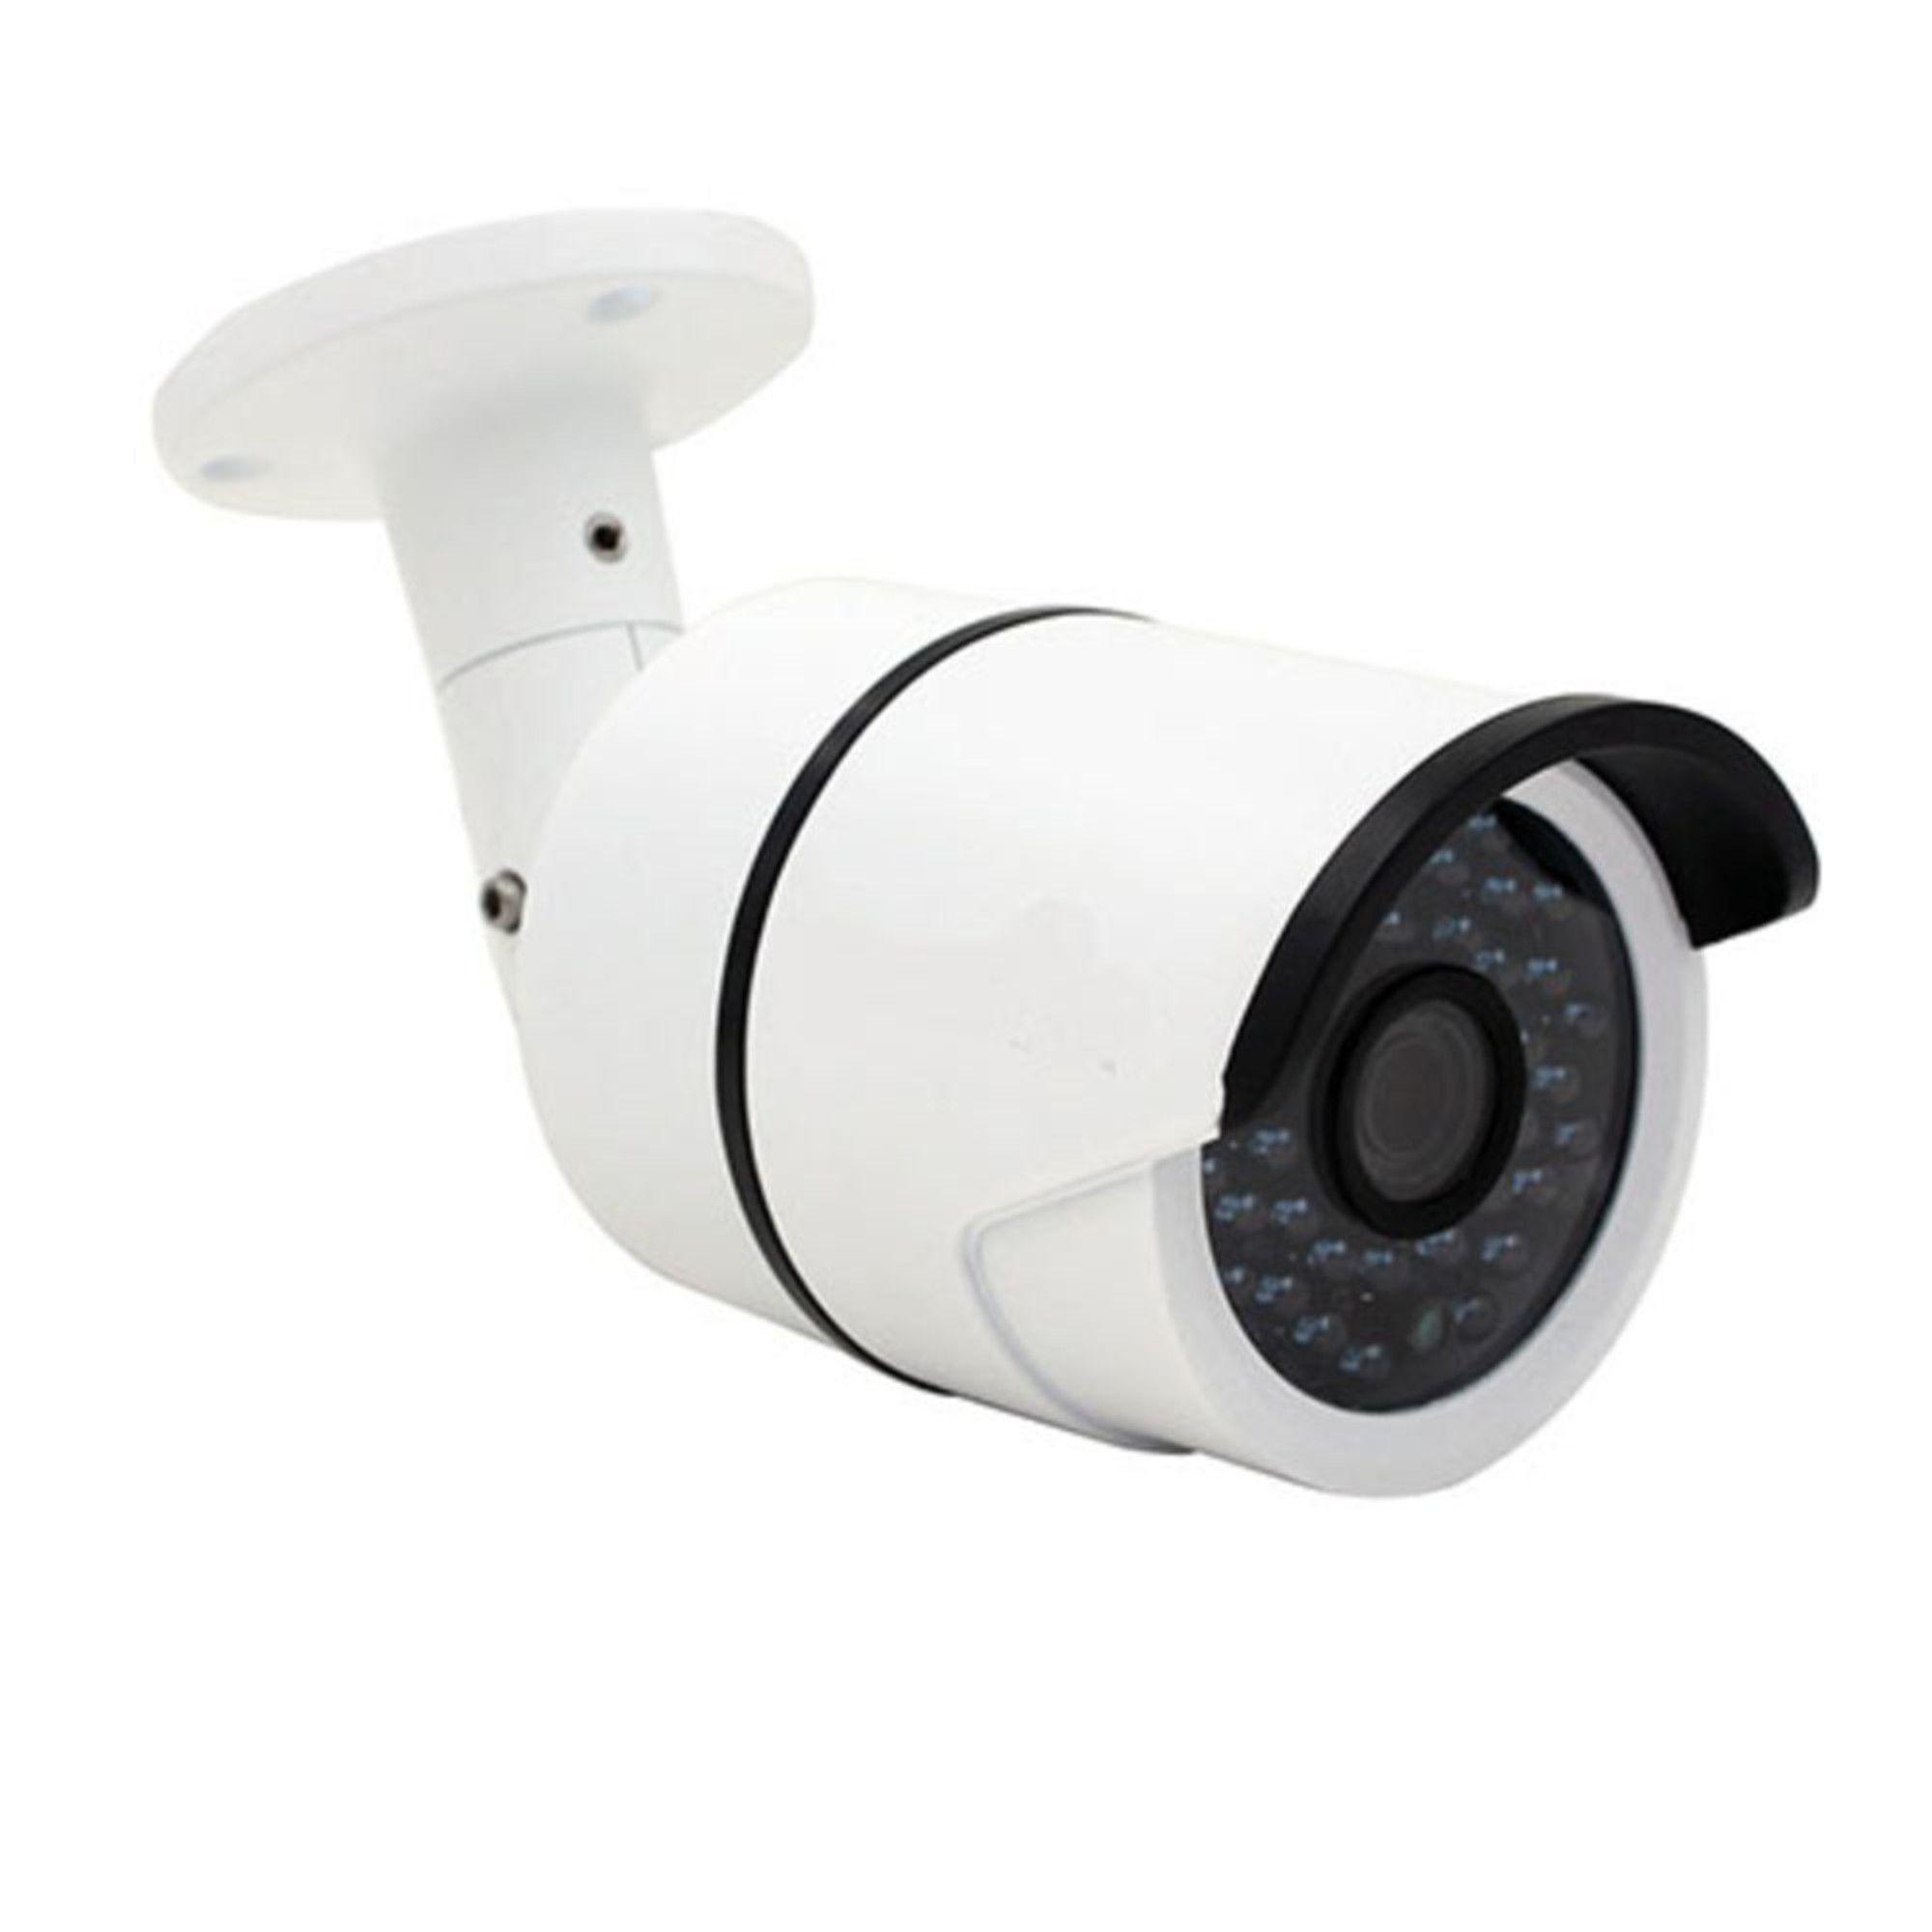 Kit CFTV Jortan Completo 4 Câmeras AHD 720p DVR 4 Canais